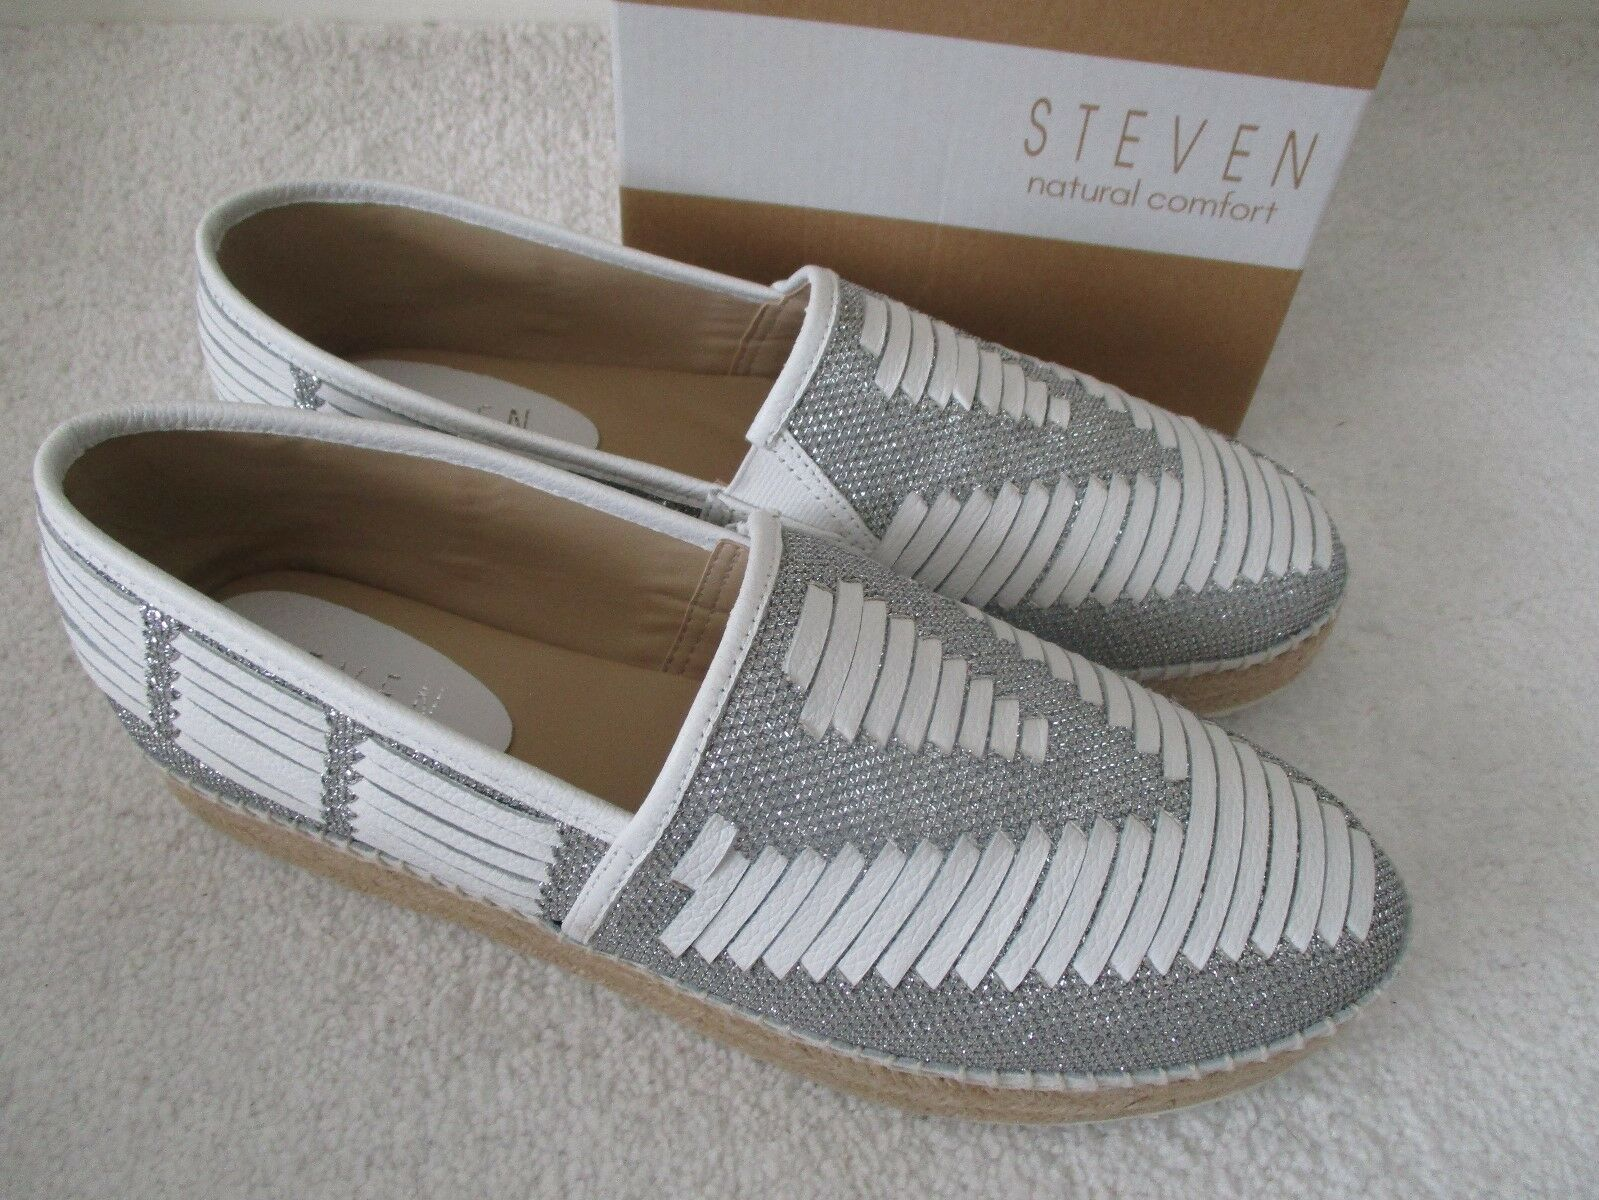 STEVEN WEISS/SILVER NC-CHARM FLAT Schuhe SIZE 9 1/2 M - NEU W BOX